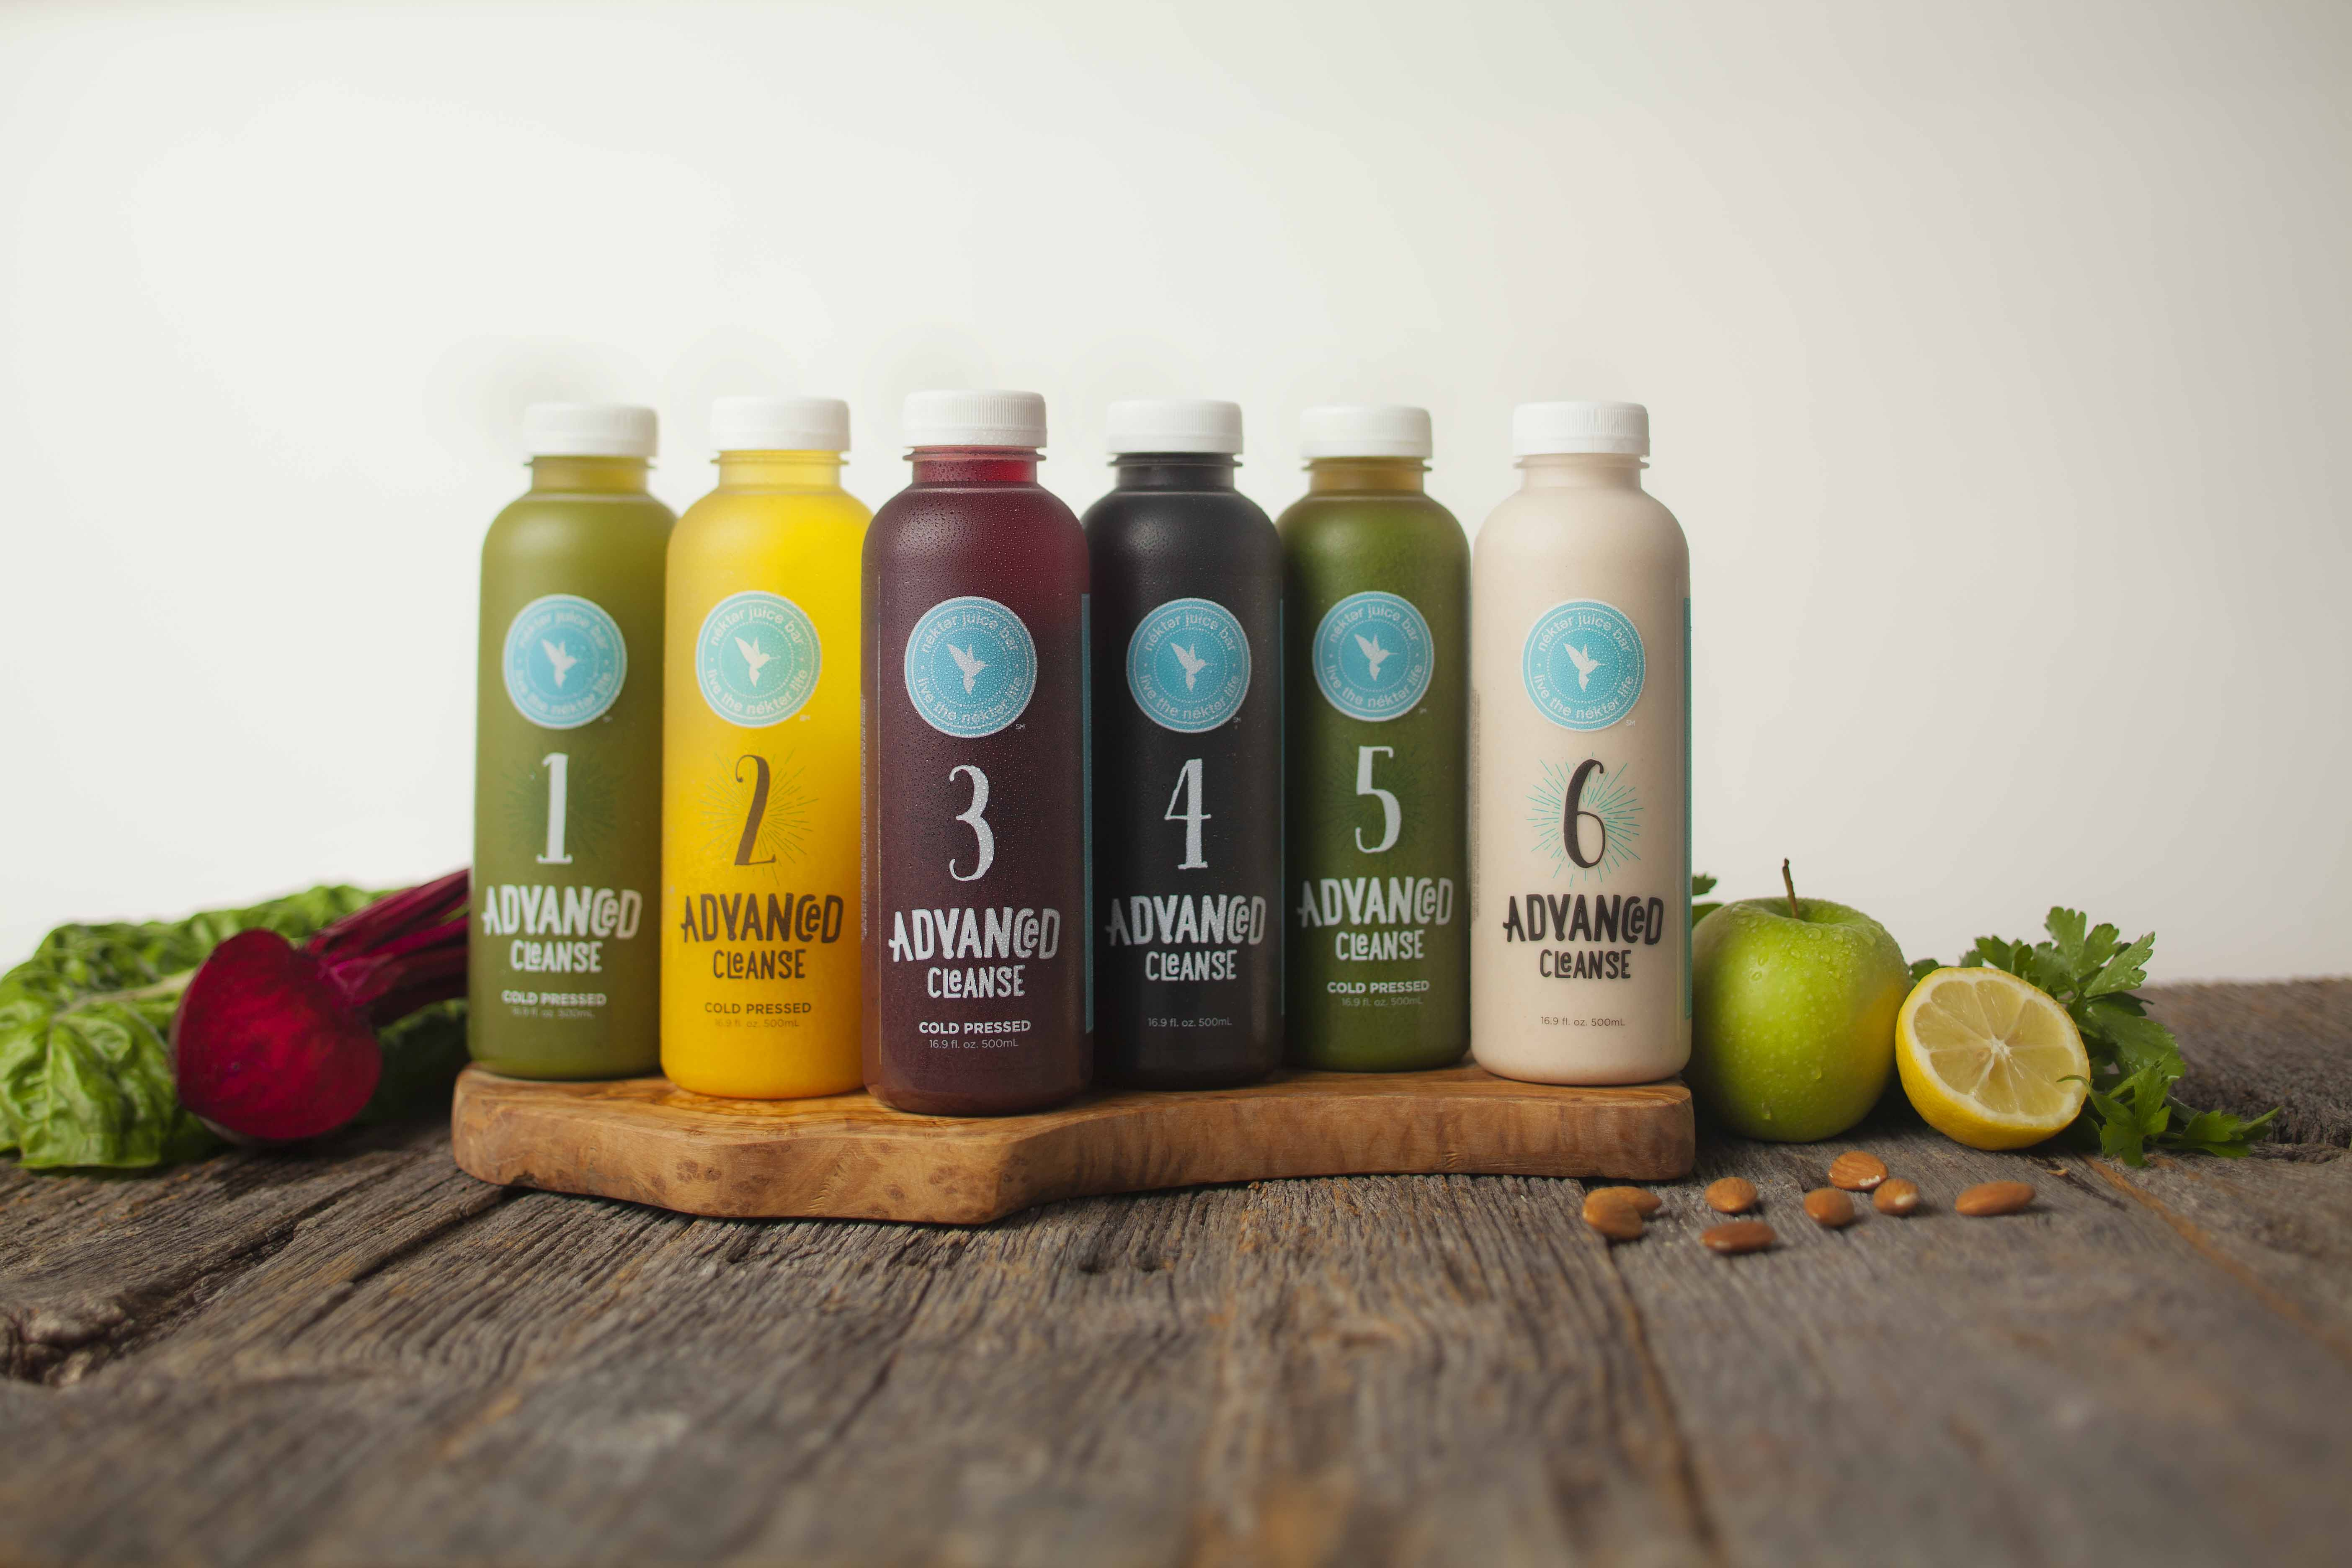 nekter juice bar cleanse, juice cleanse, cleansing, benefits of juicing, benefits of cleansing